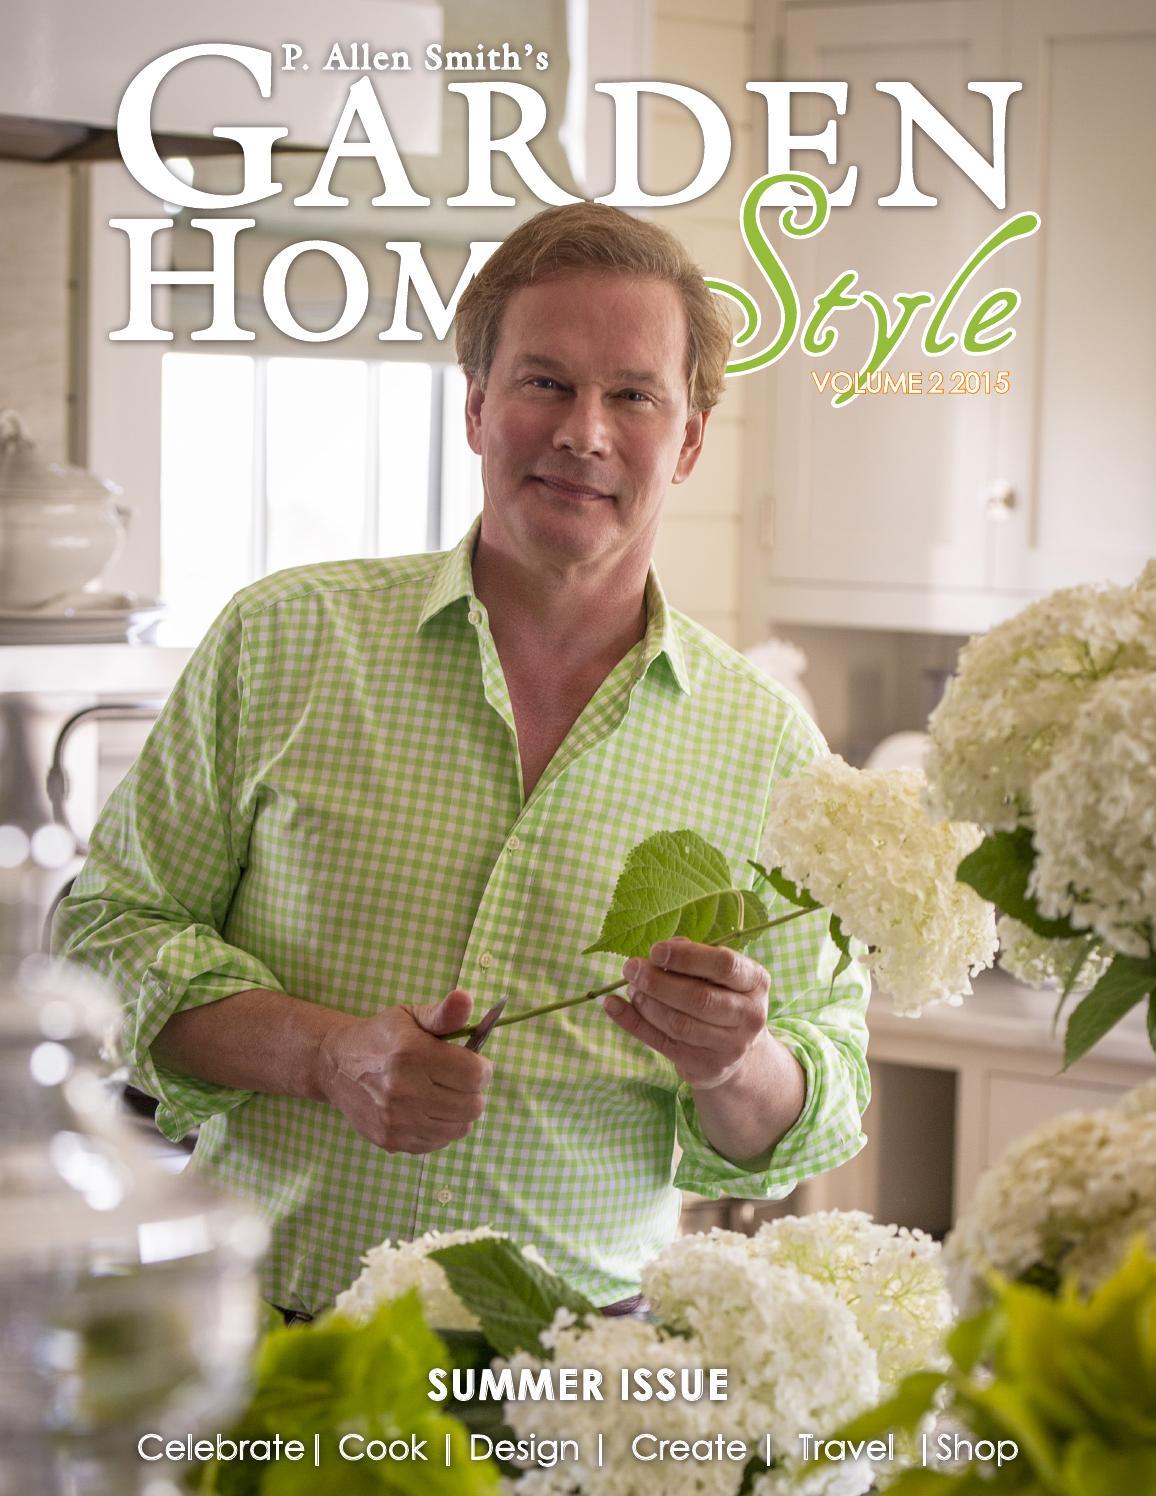 P Allen Smith 39 S Garden Home Style Summer 2015 By P Allen Smith 39 S Naturally Issuu